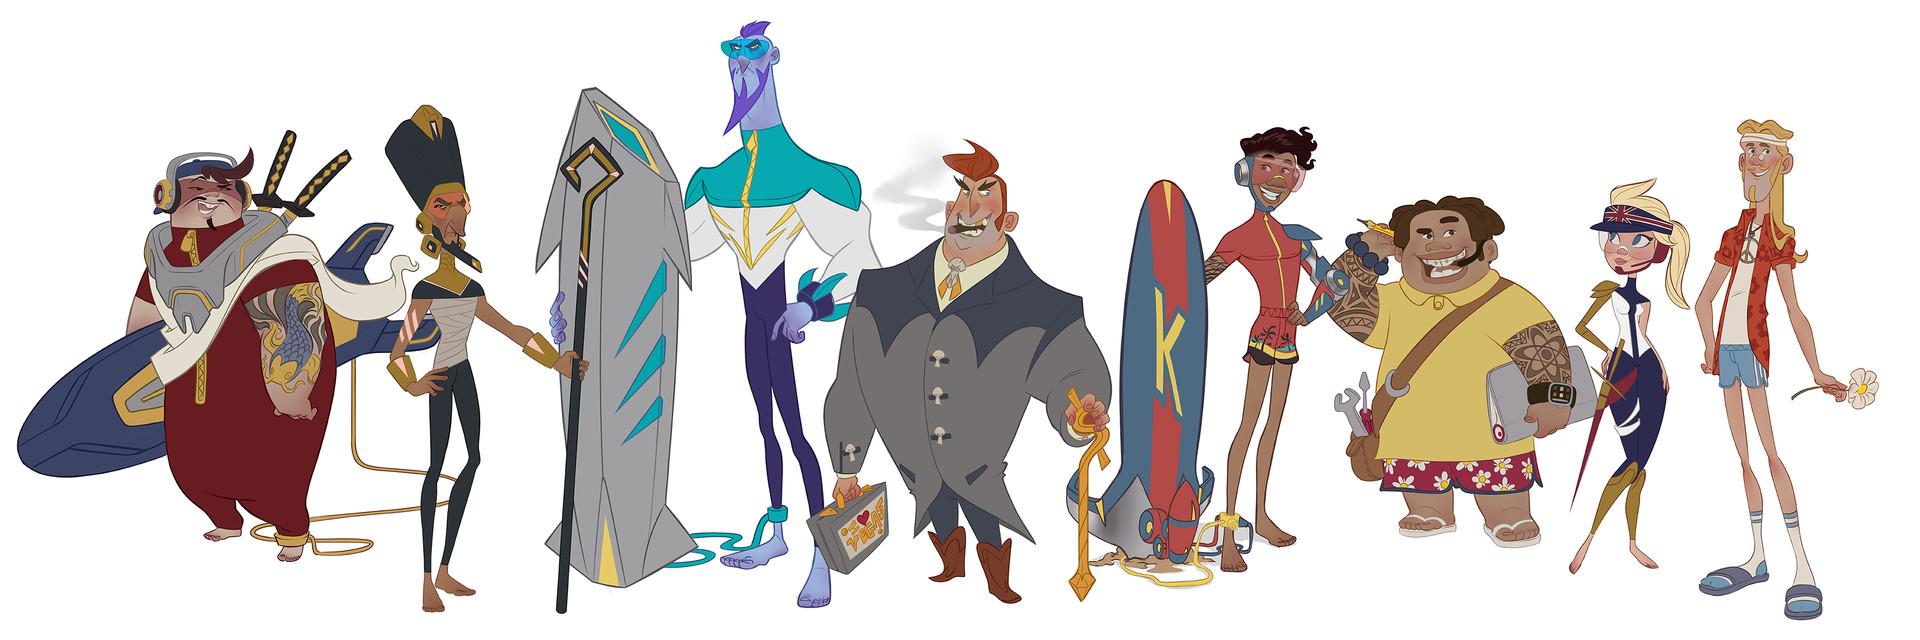 rodrigo-wolff-big-waves-all-characters